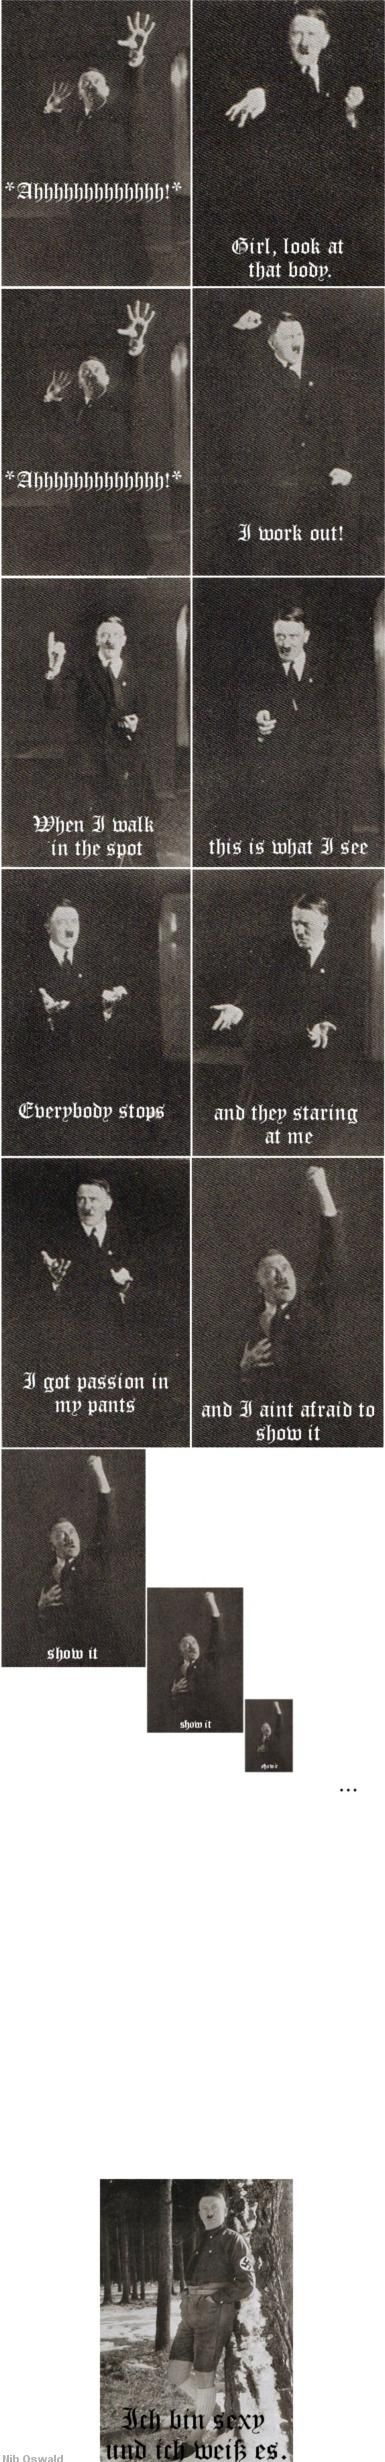 Previously unseen photos of Adolf Hitler released...